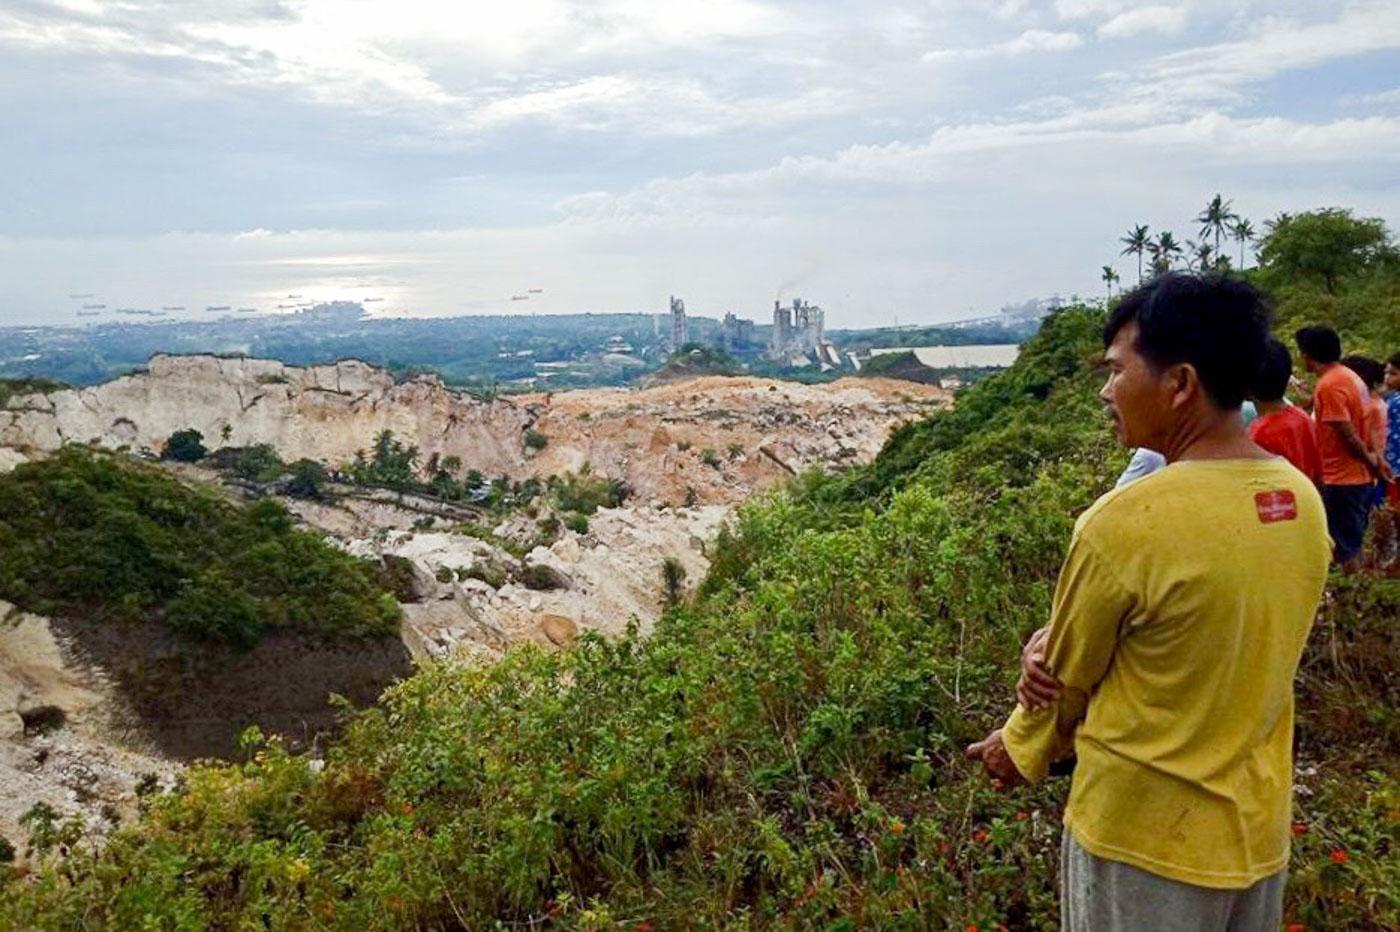 Twin tragedies: How Itogon and Naga landslides are alike